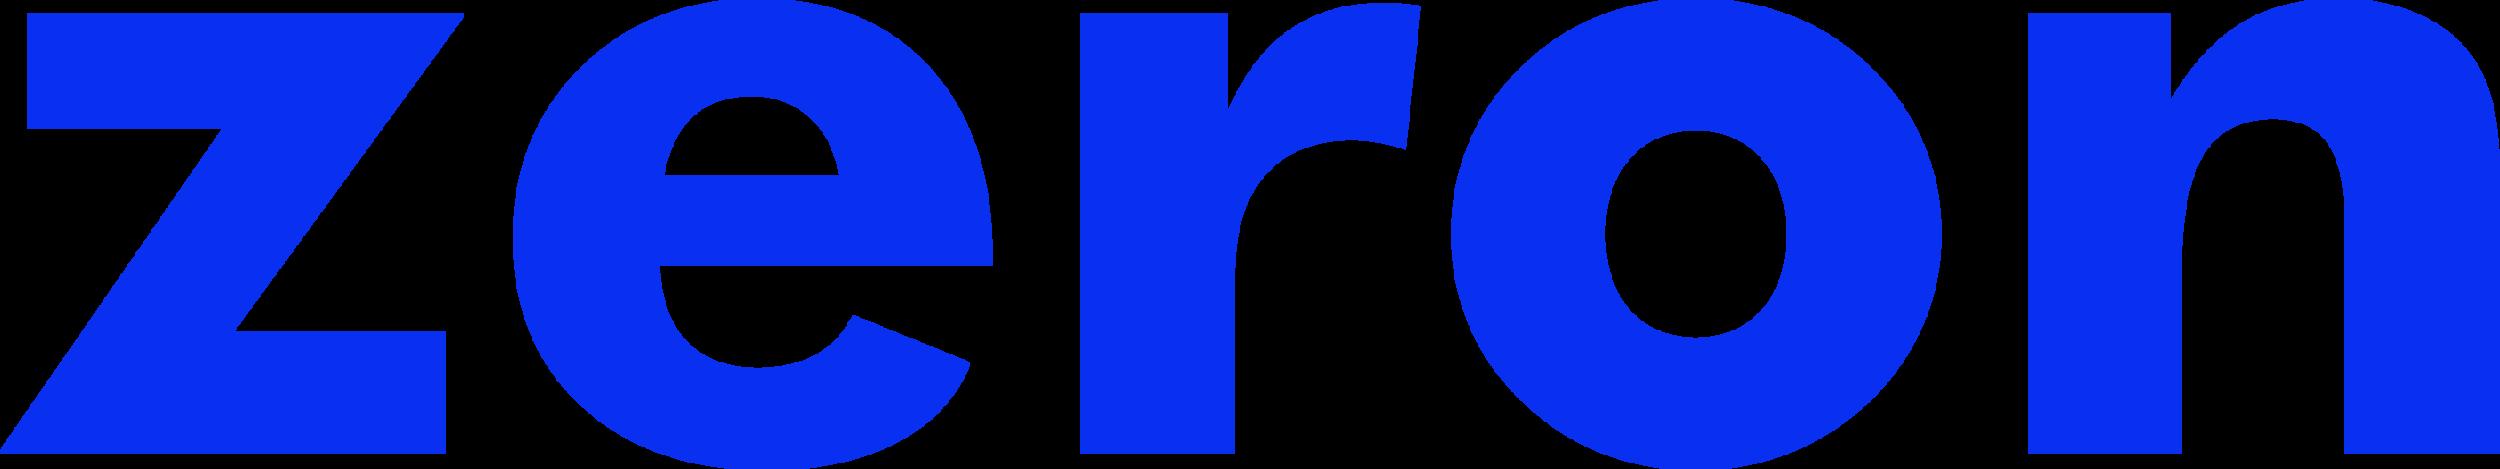 Zeron Logo PNG.png